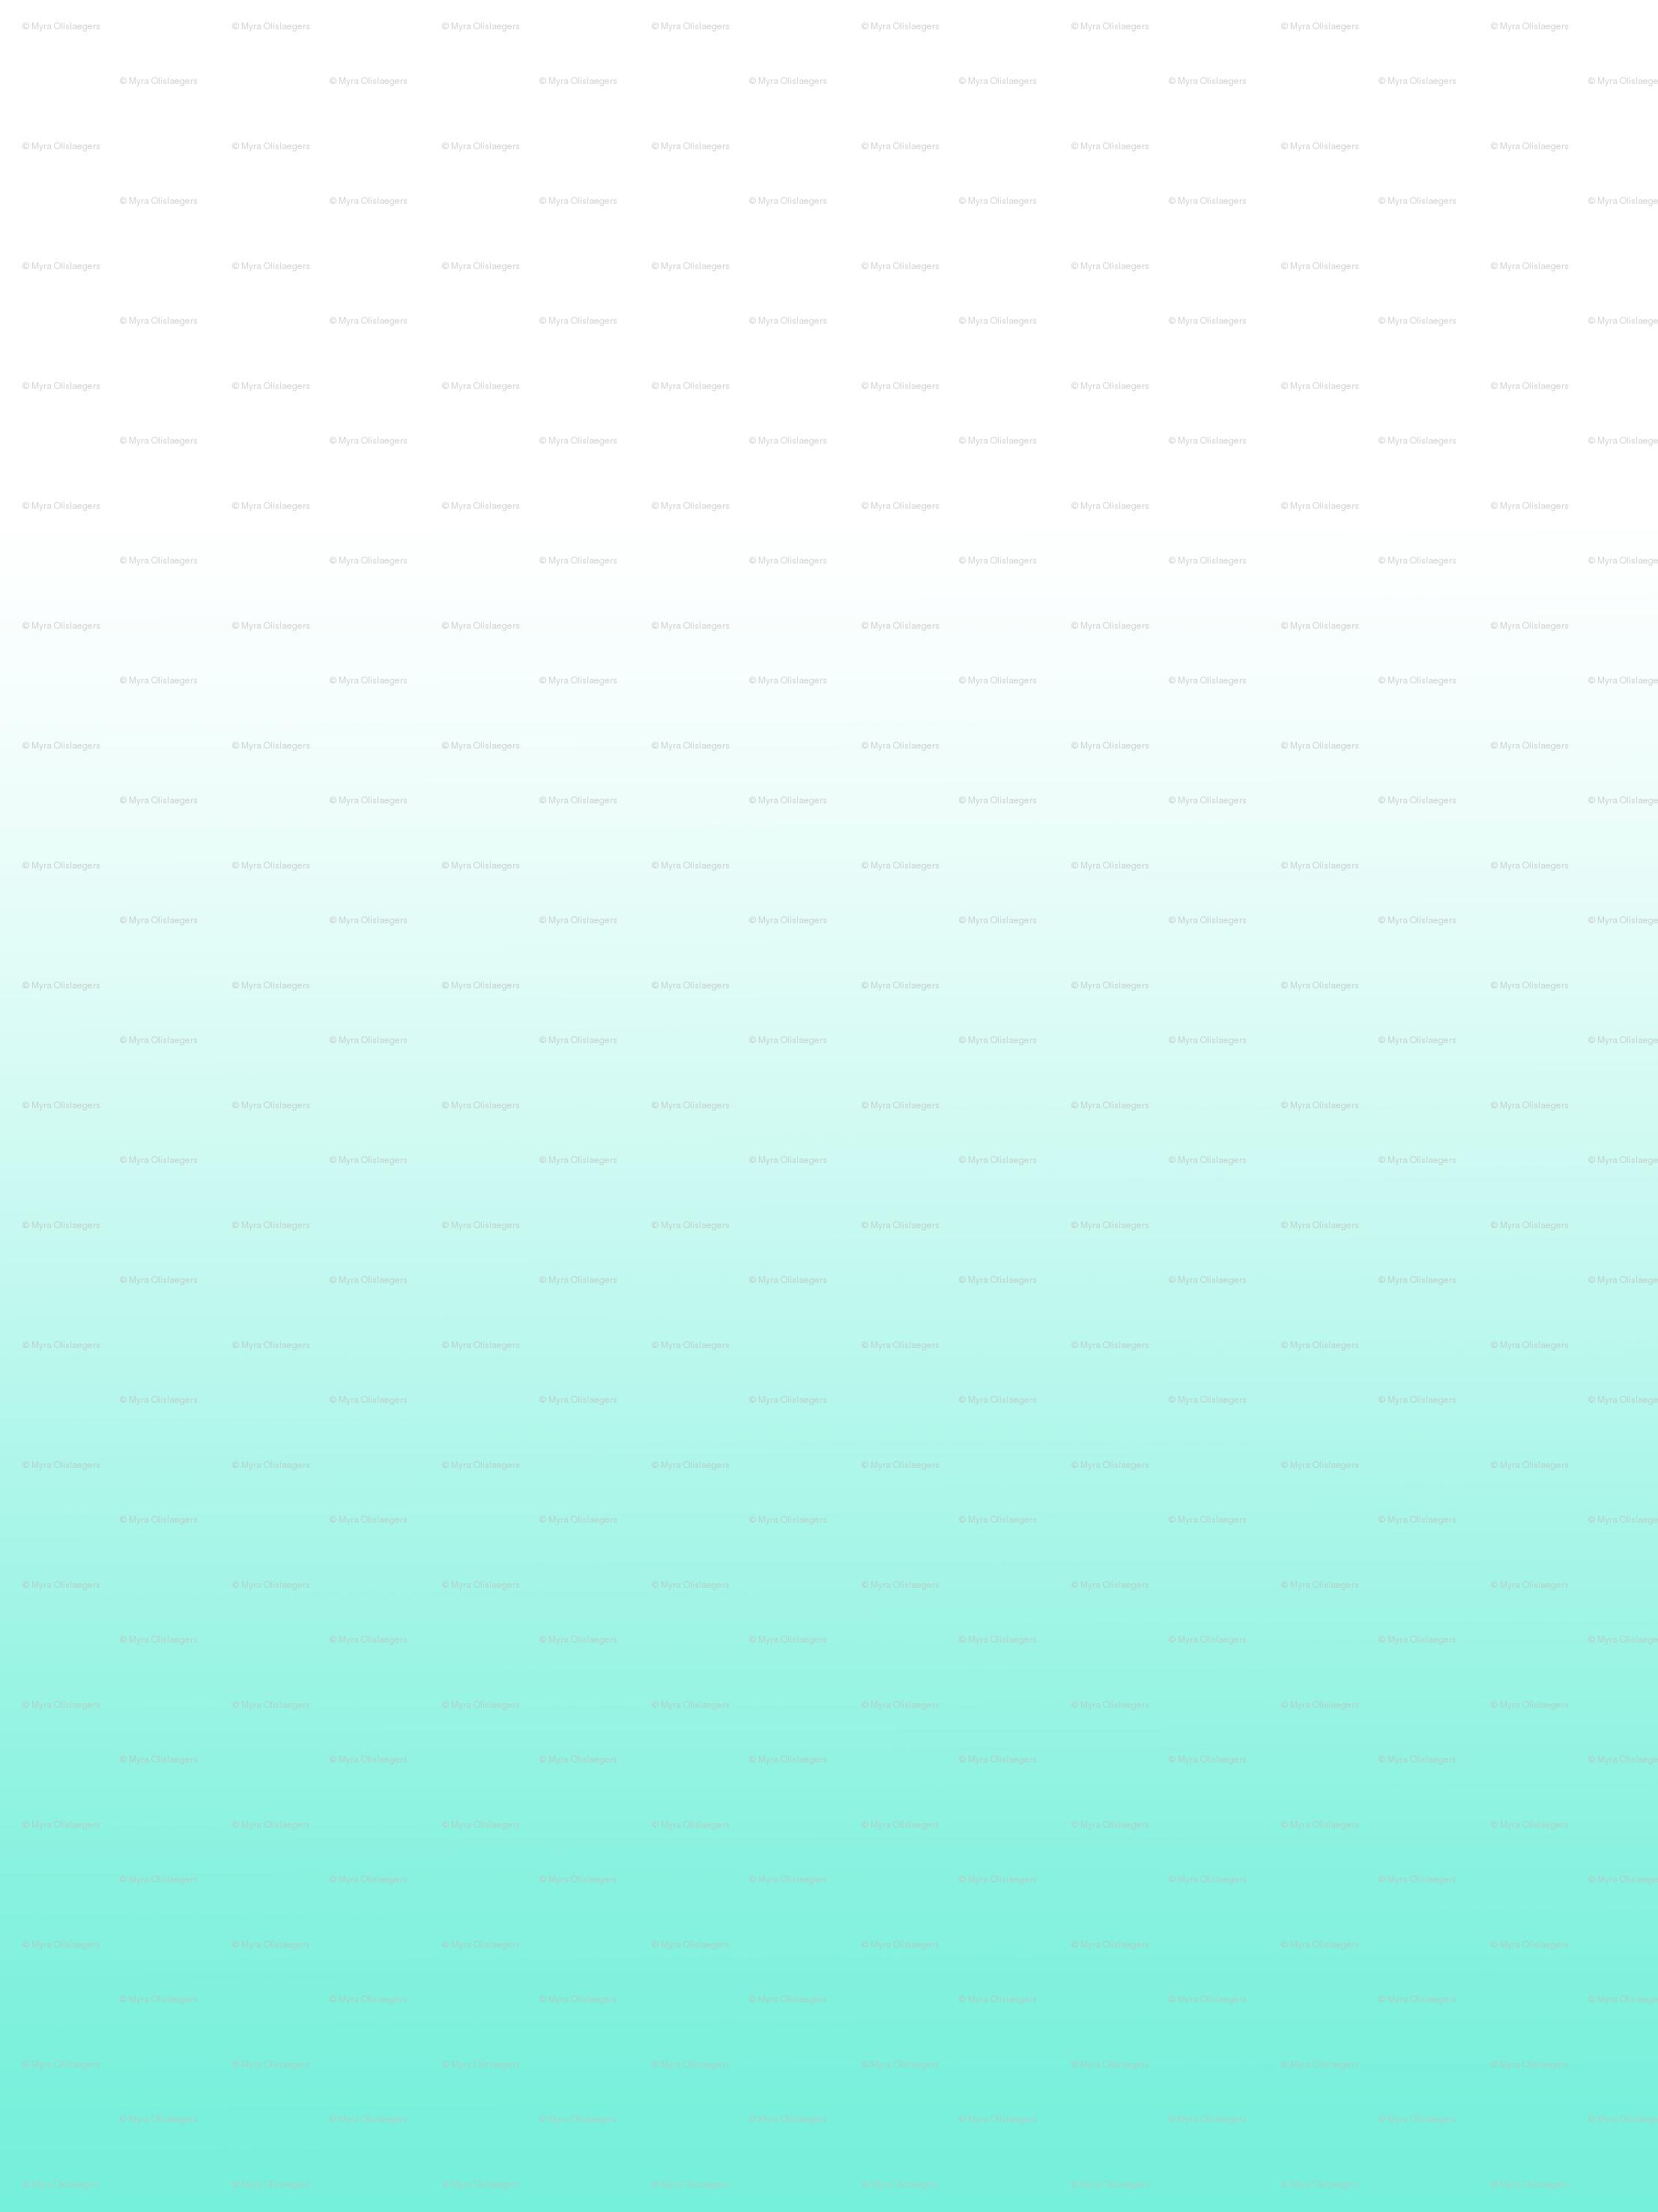 Mint Blue Wallpapers - Top Free Mint